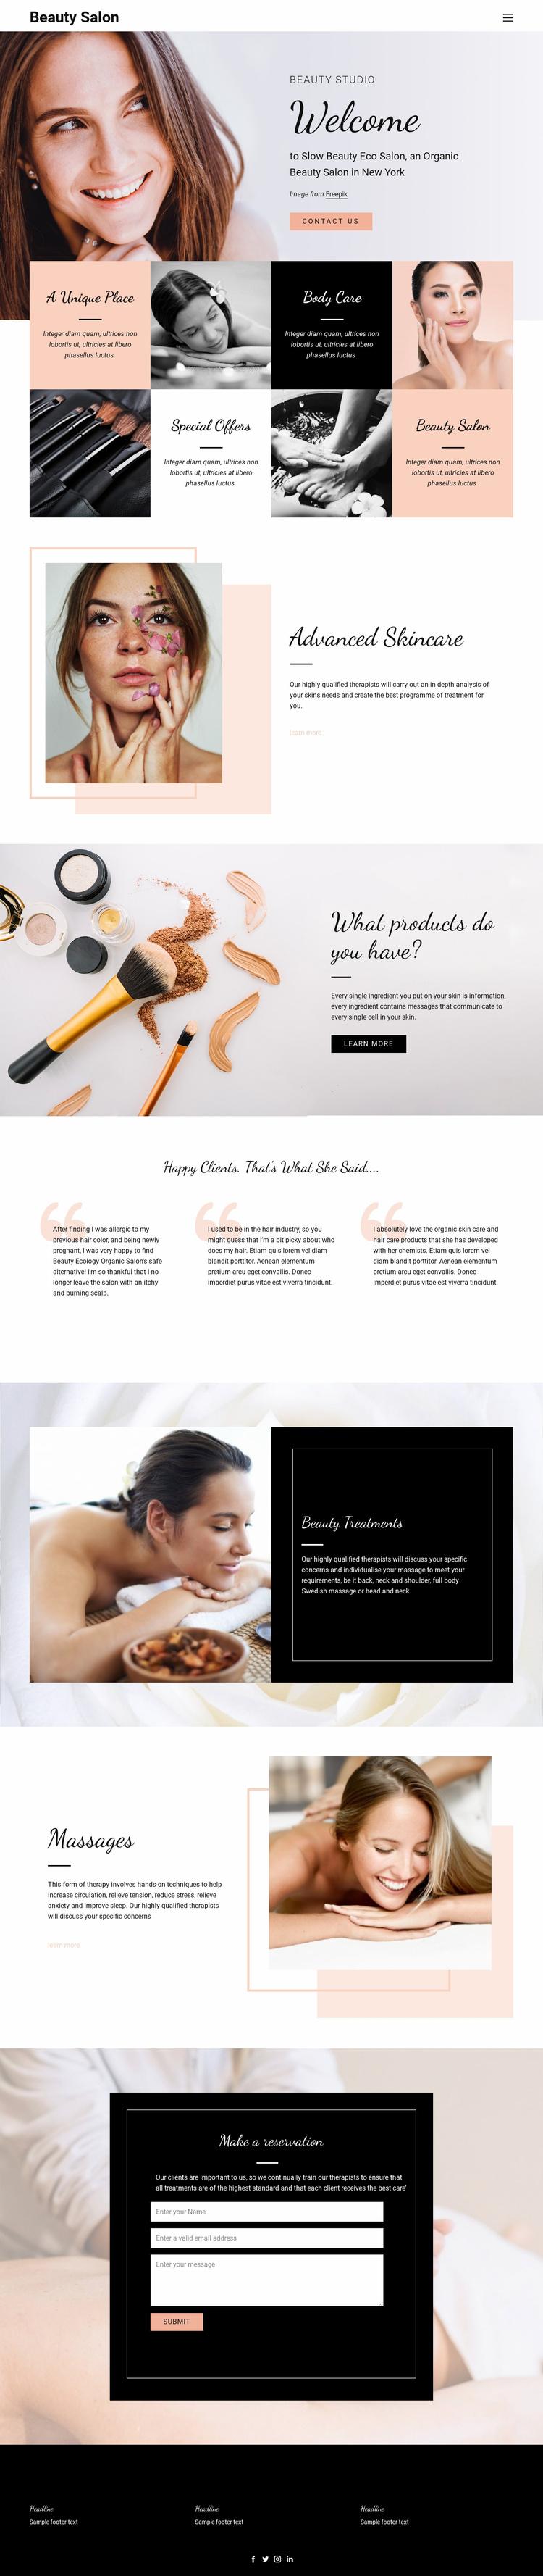 Hair, nail and beauty salon Website Template